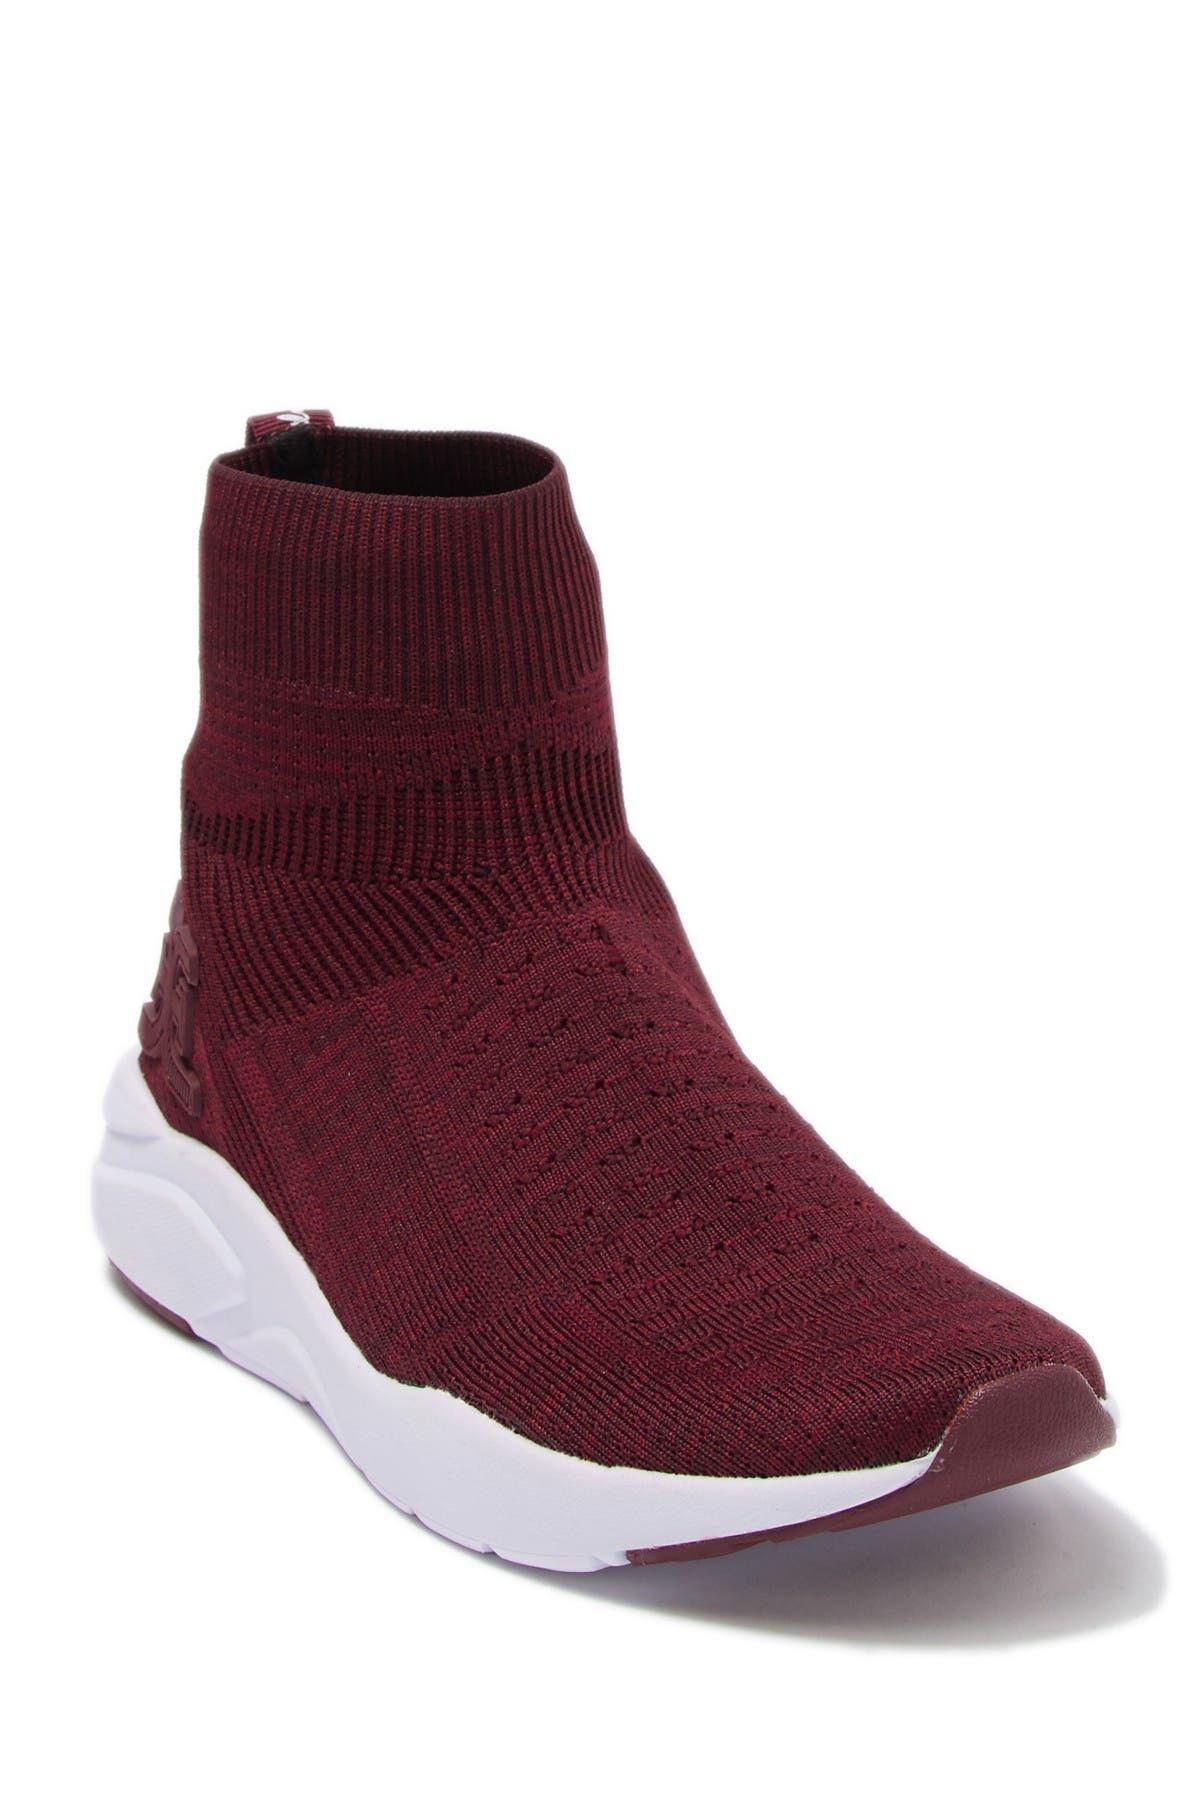 Sam Edelman | Tara Knit Sneaker | HauteLook